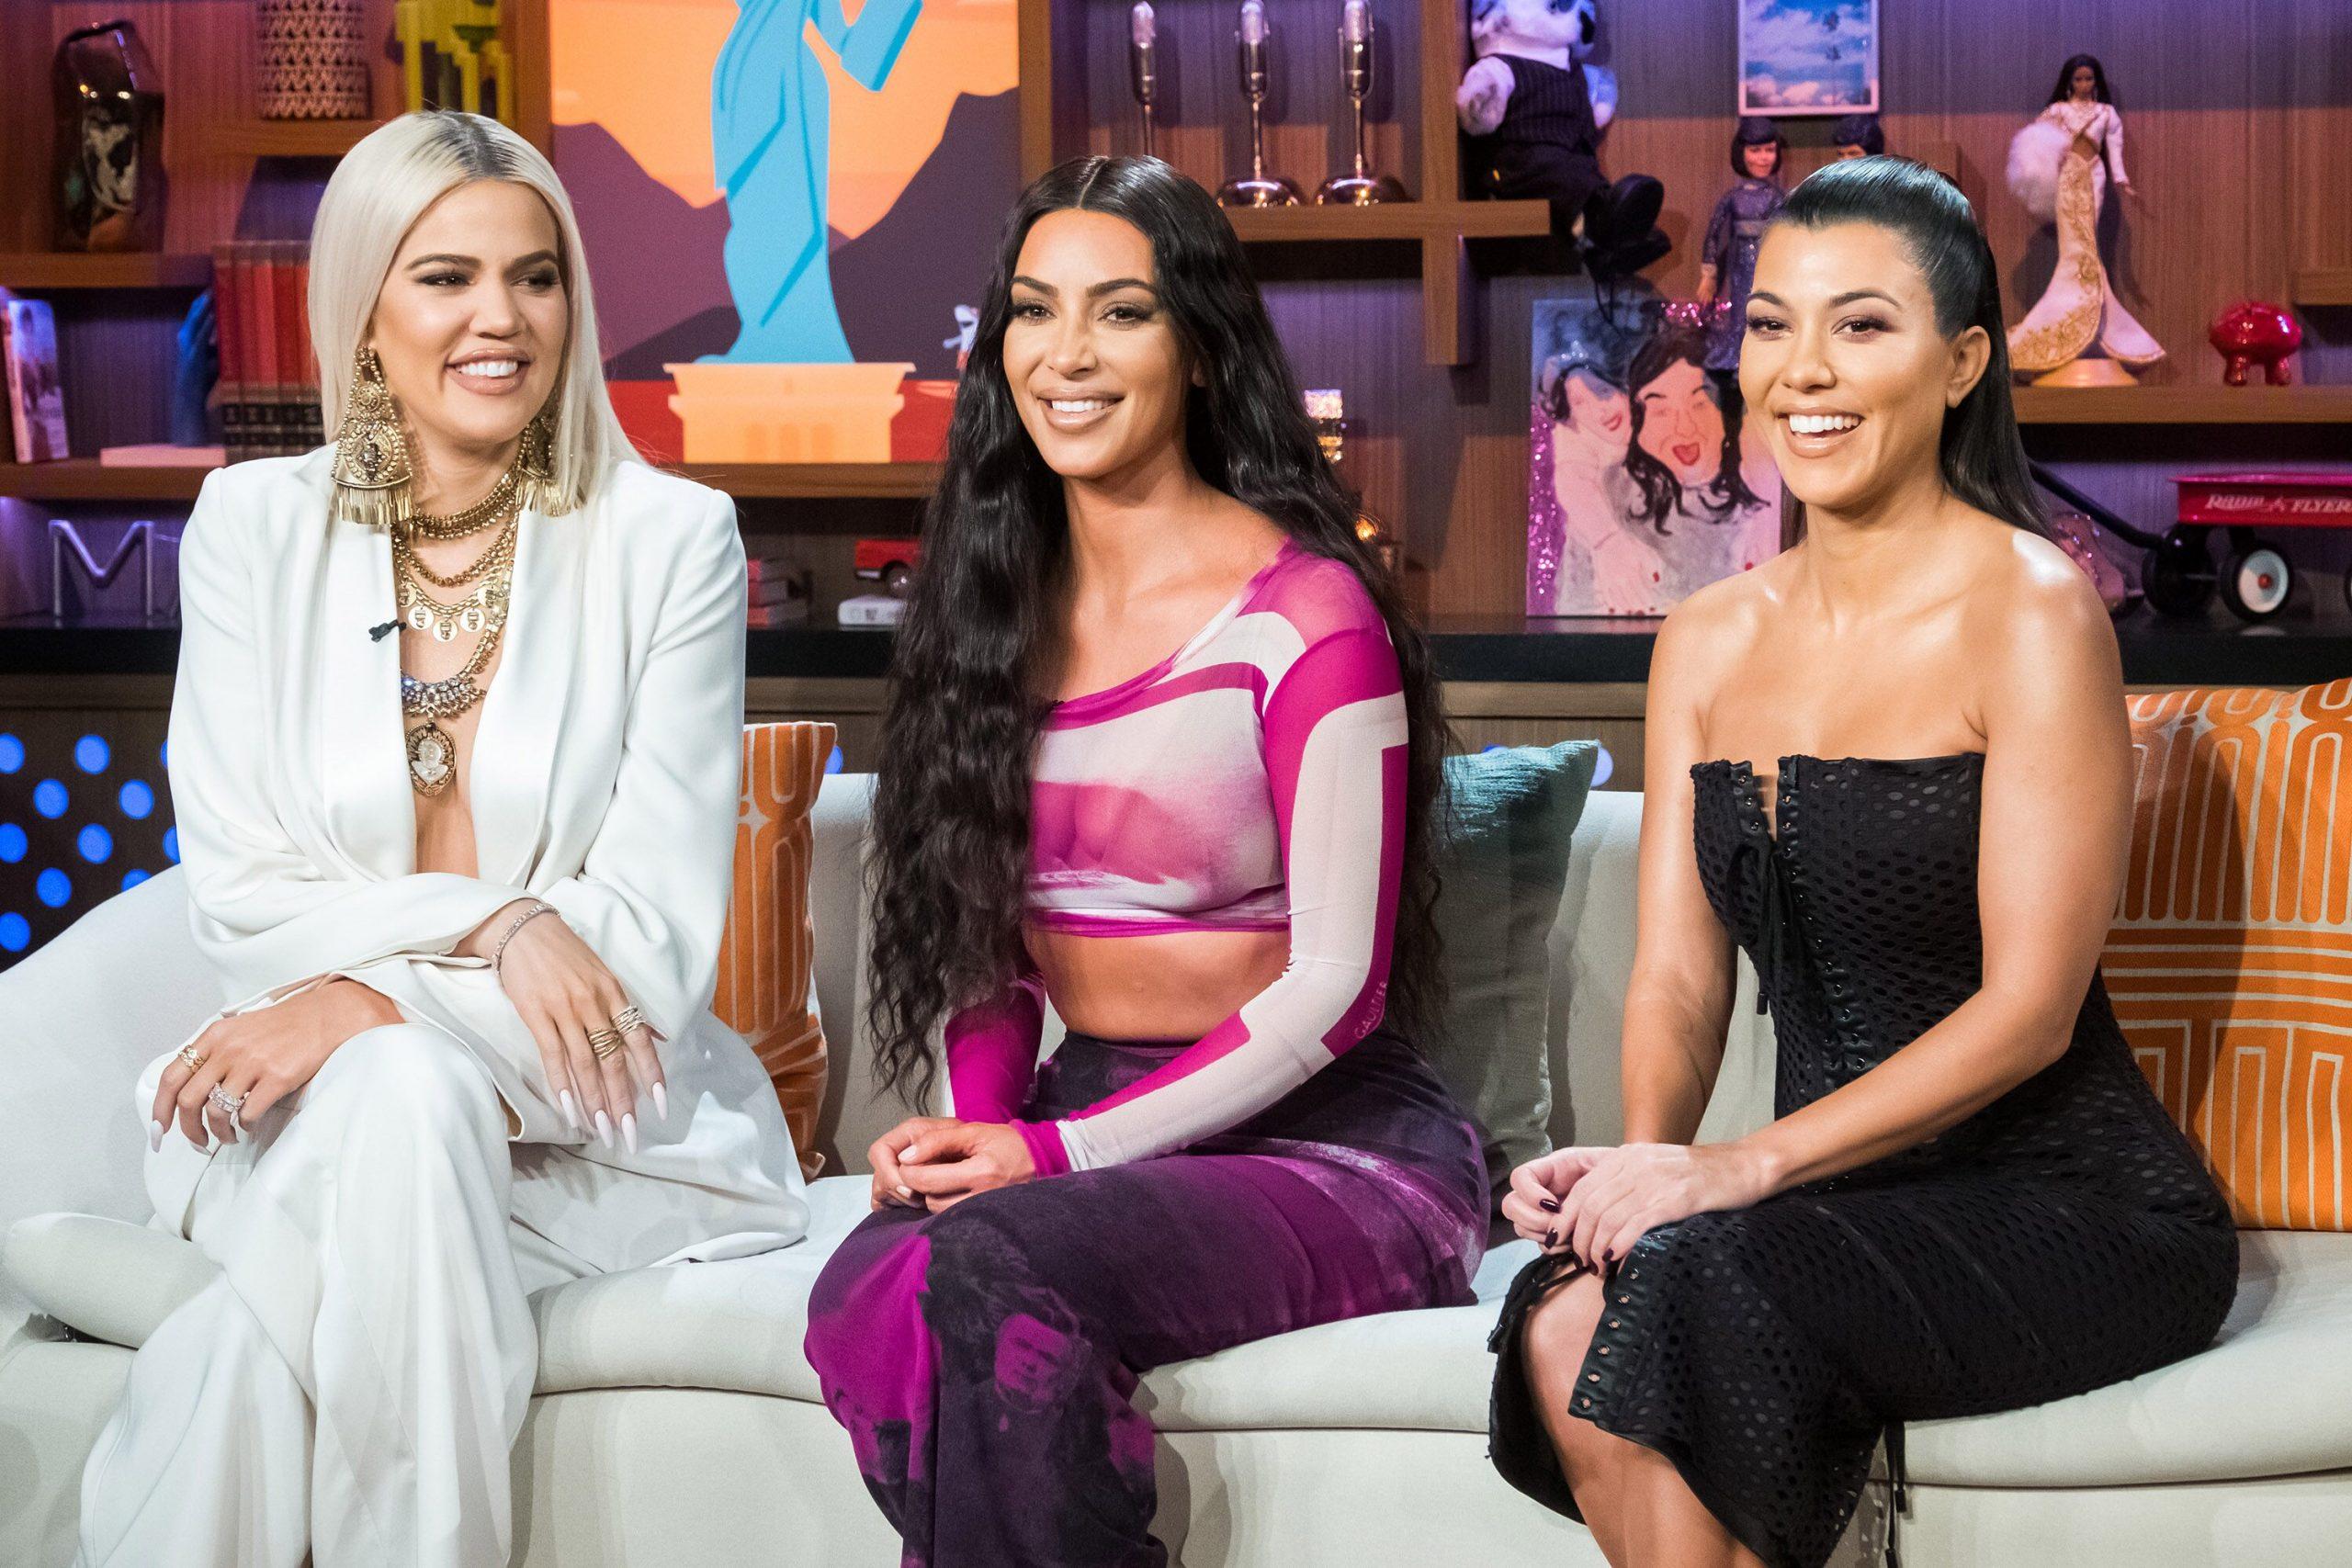 Kim Kardashian shares 'KUWTK' bikini photo with sisters Courtney and Klose: 'Trifecta 2006'